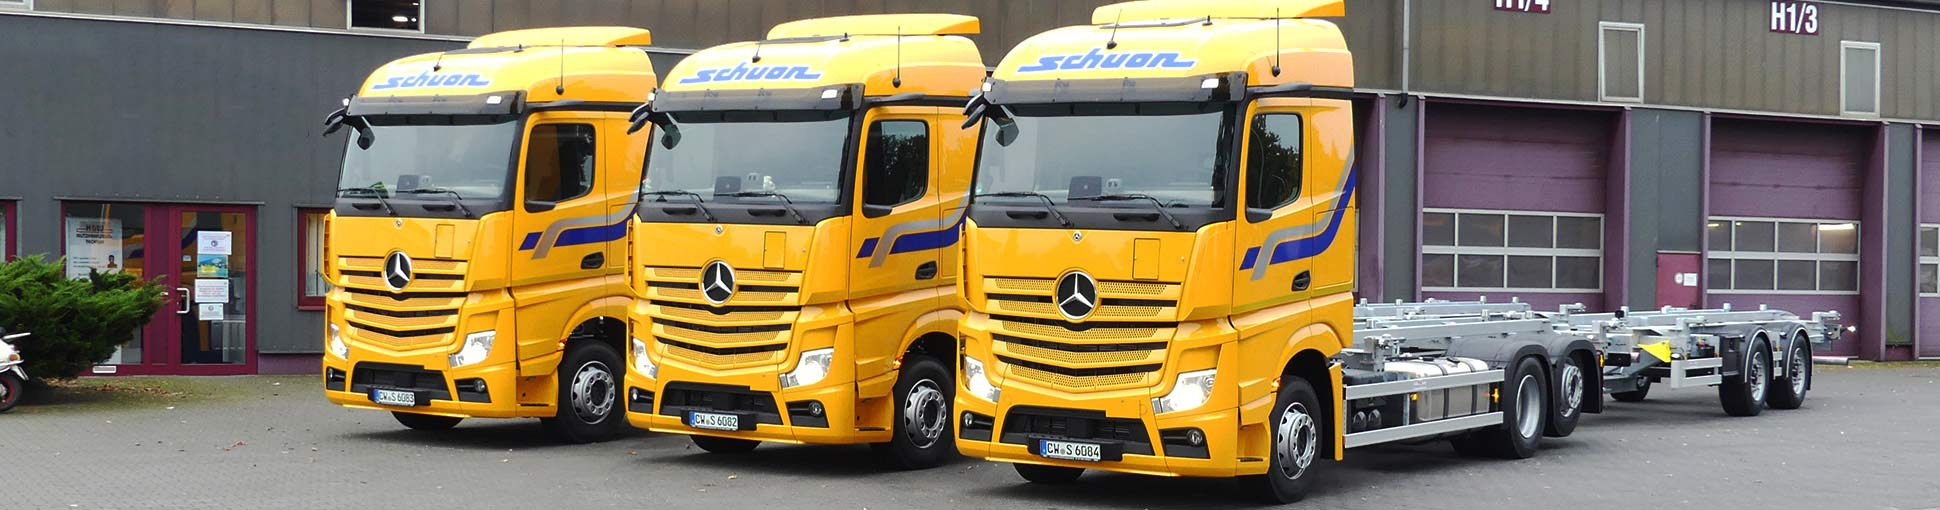 Transportlogistik systemverkehre